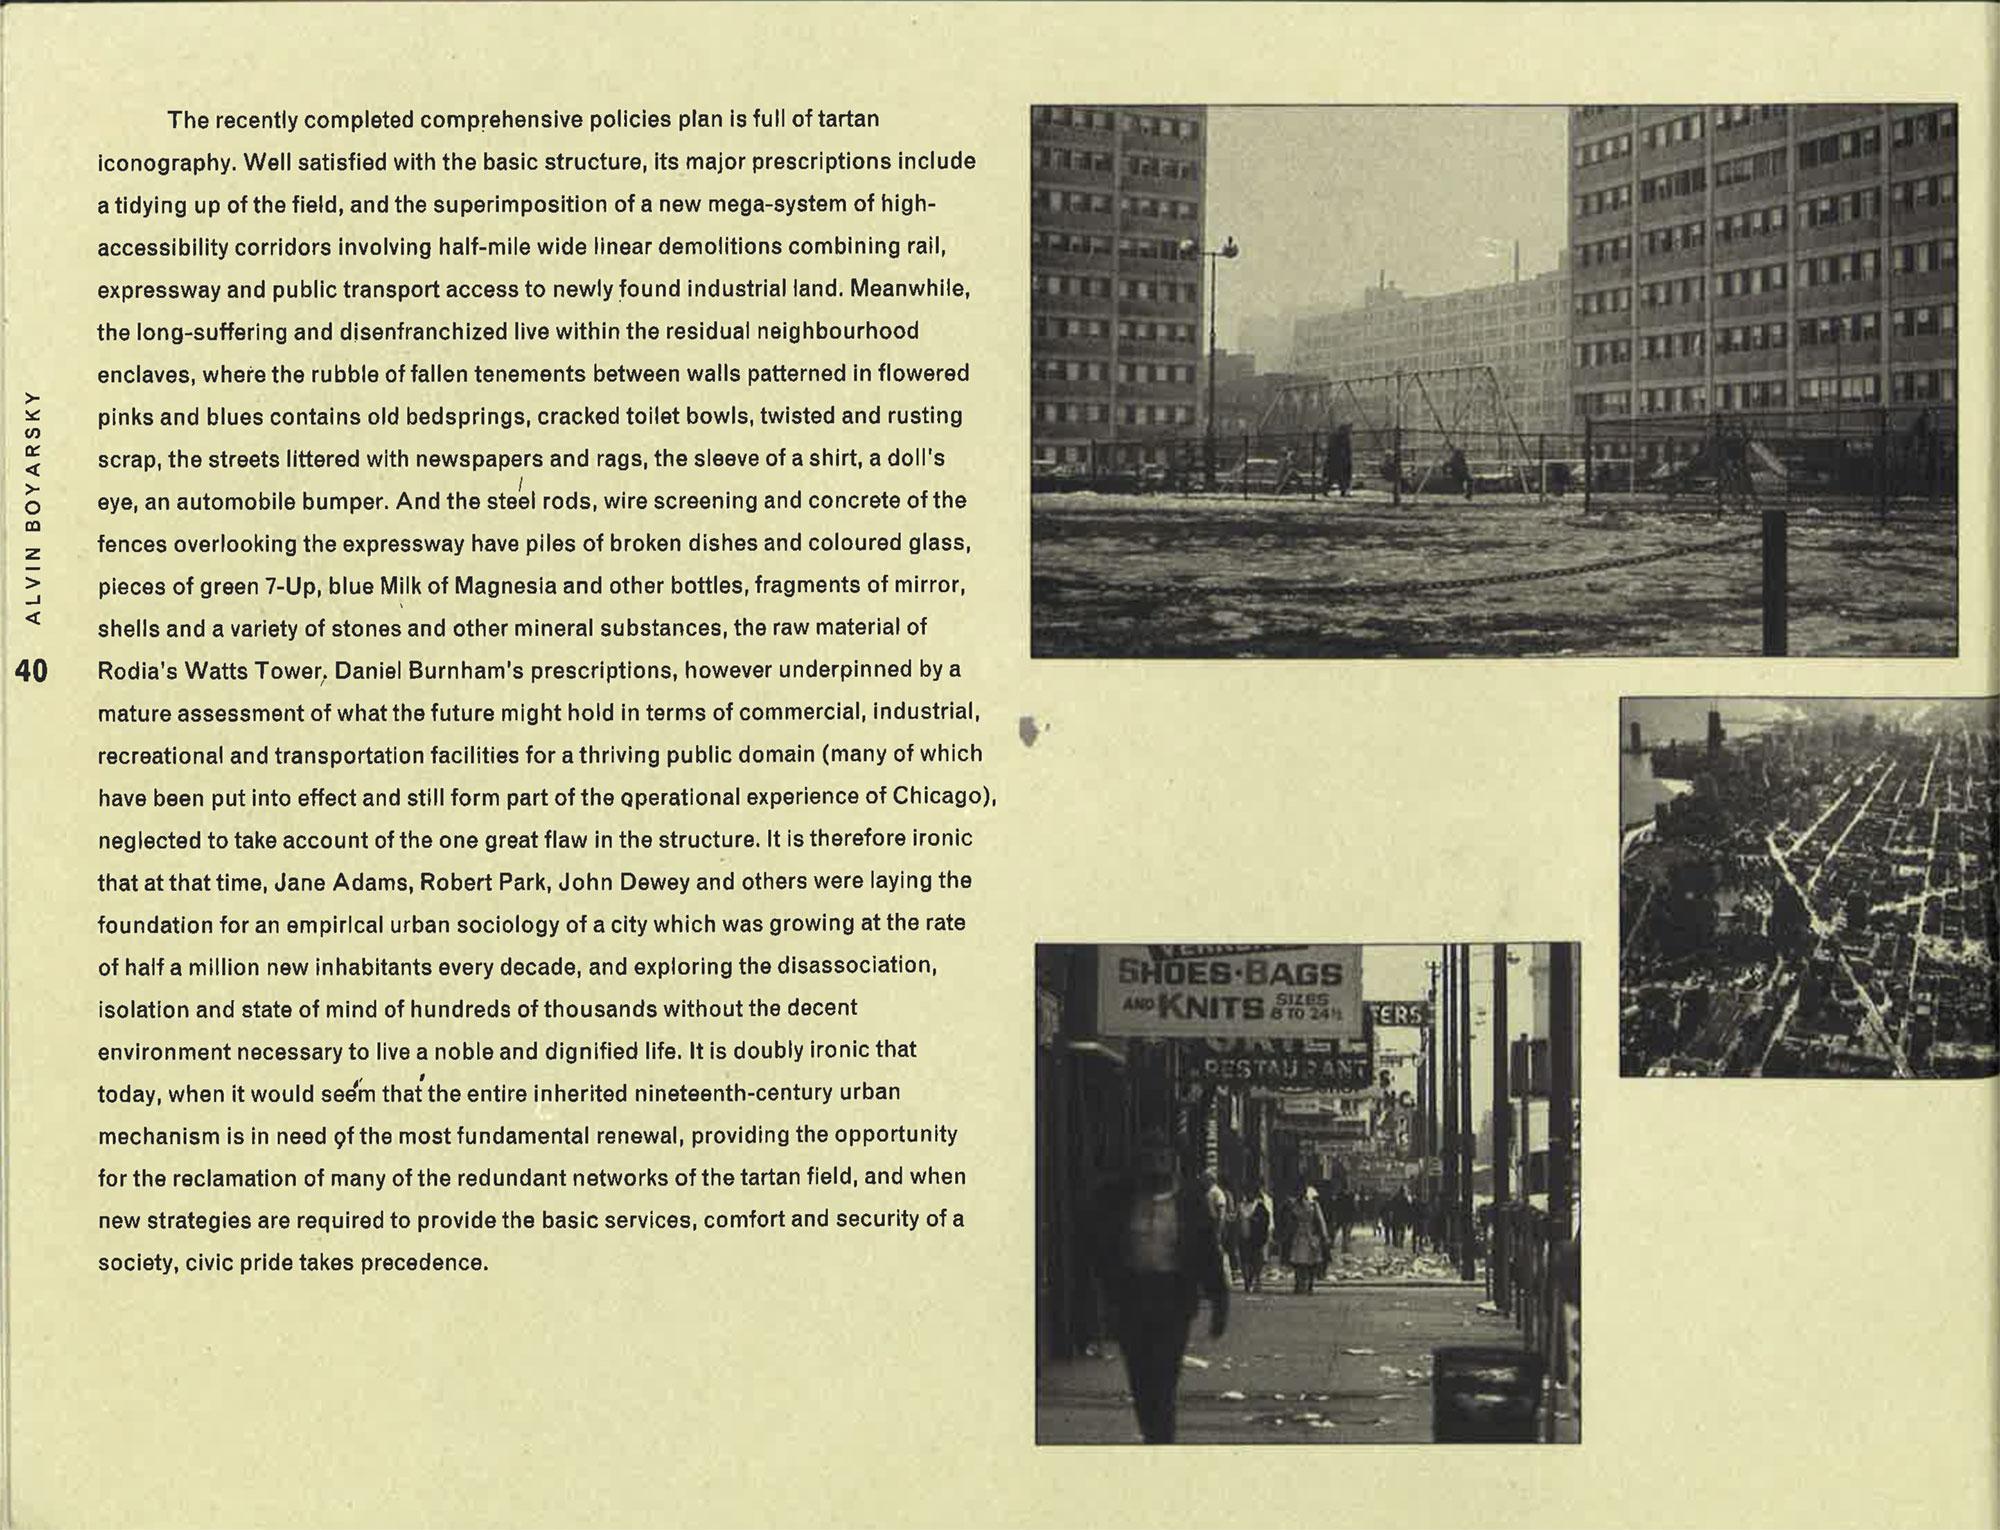 Alvin Boyarsky, Chicago à la carte, The City as an Energy System ...